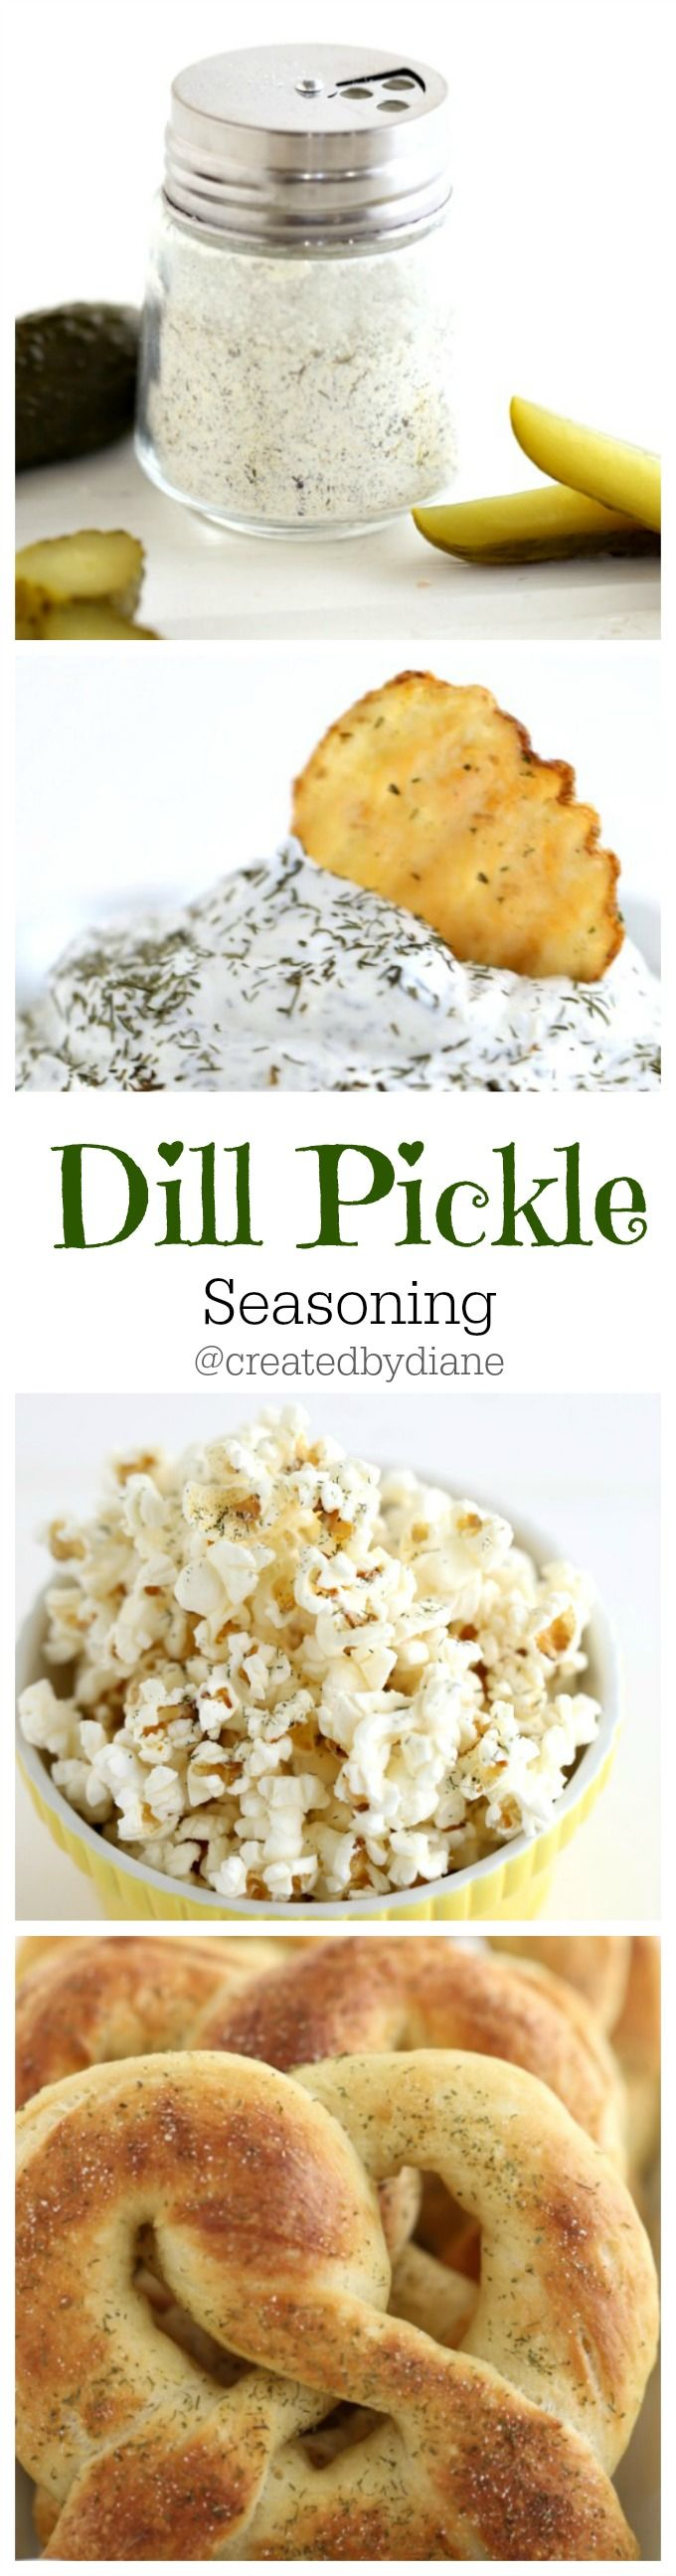 Dill Pickle recipes @createdbydiane